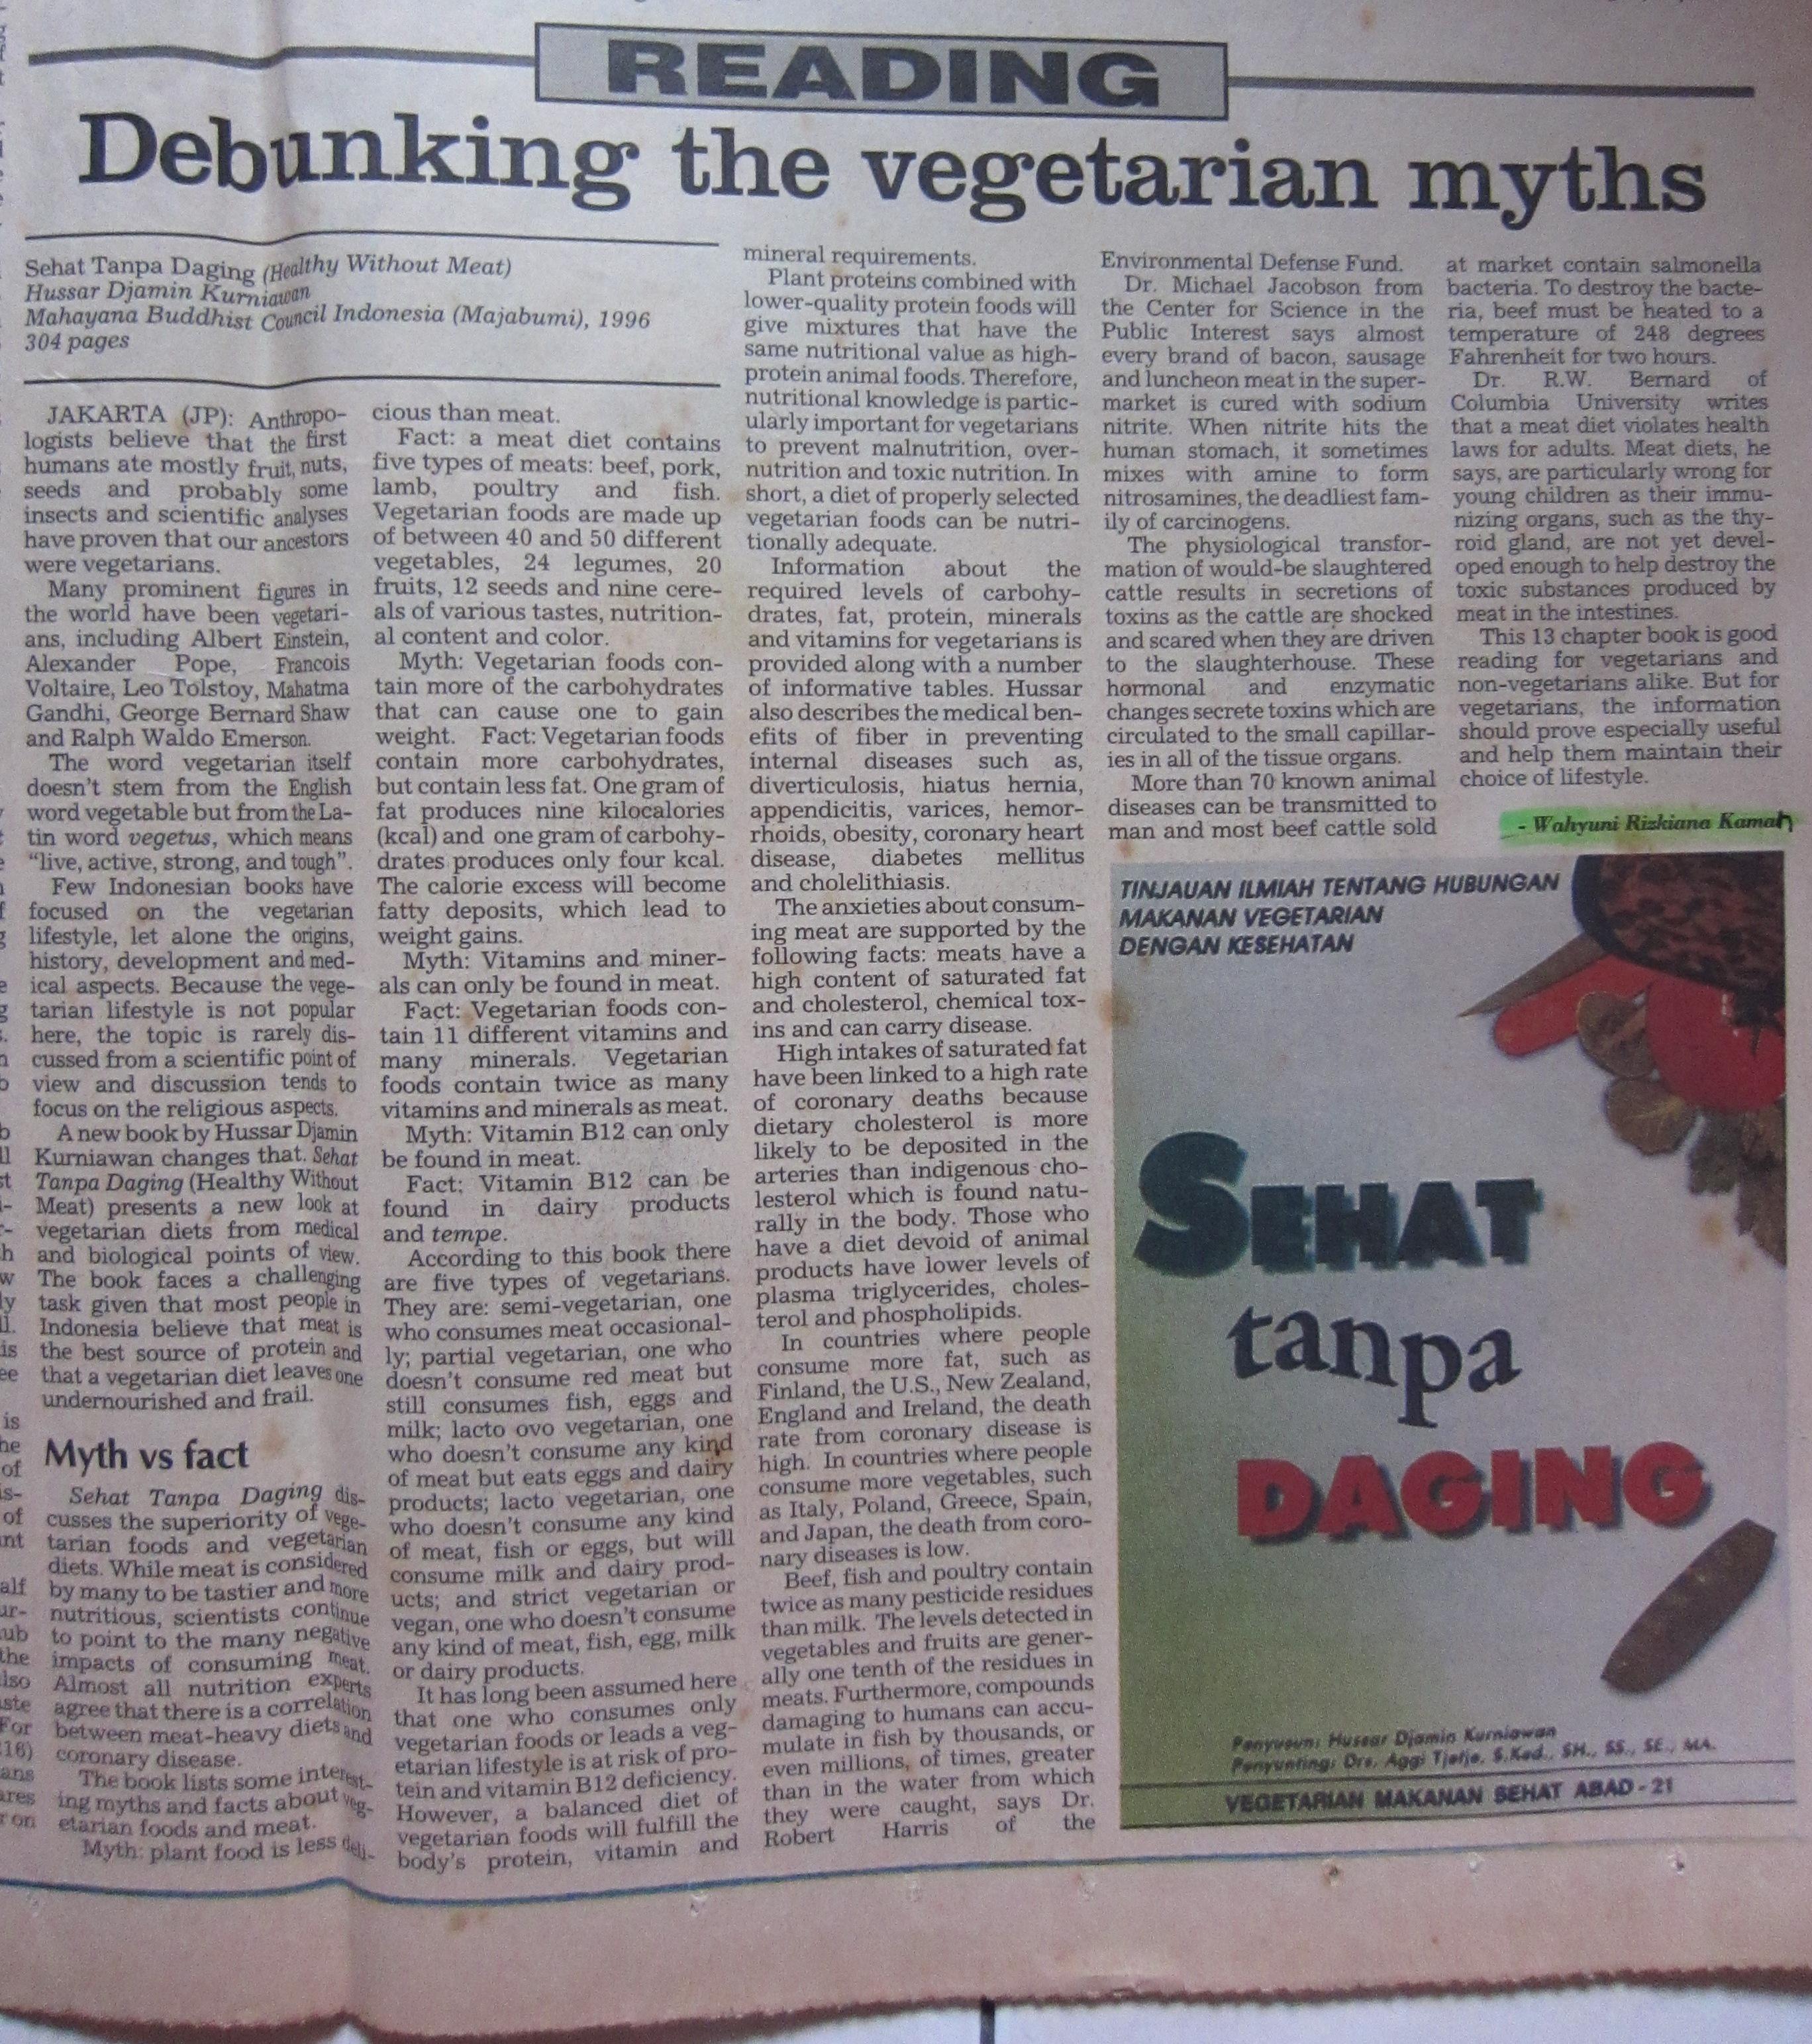 1996 Dec 15-The Jakarta Post, Debunking